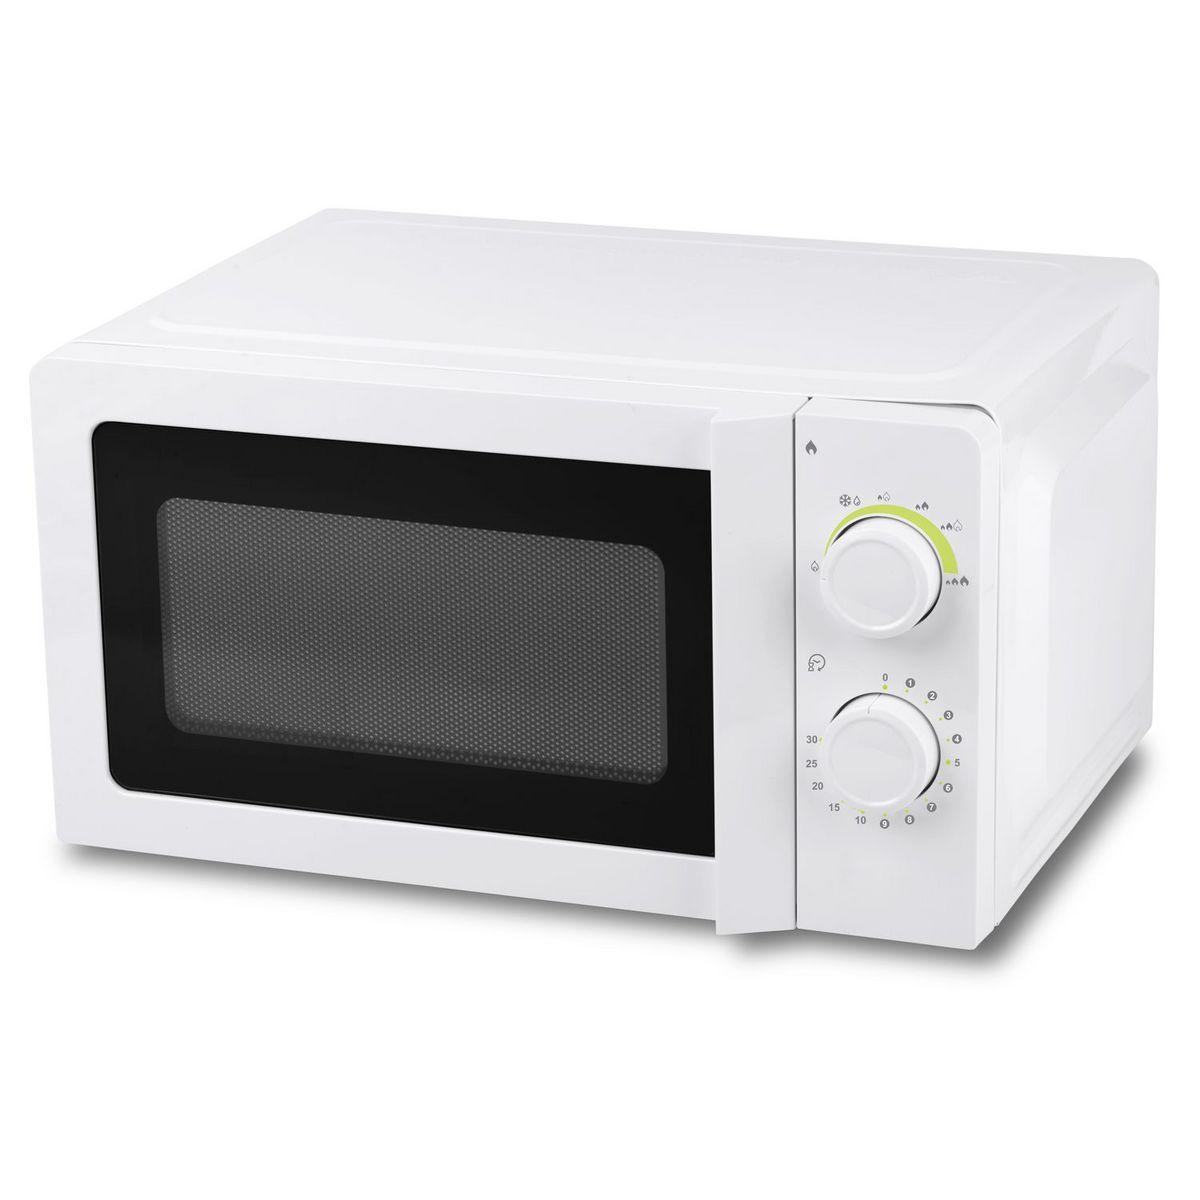 Micro-ondes - 130138 - Blanc